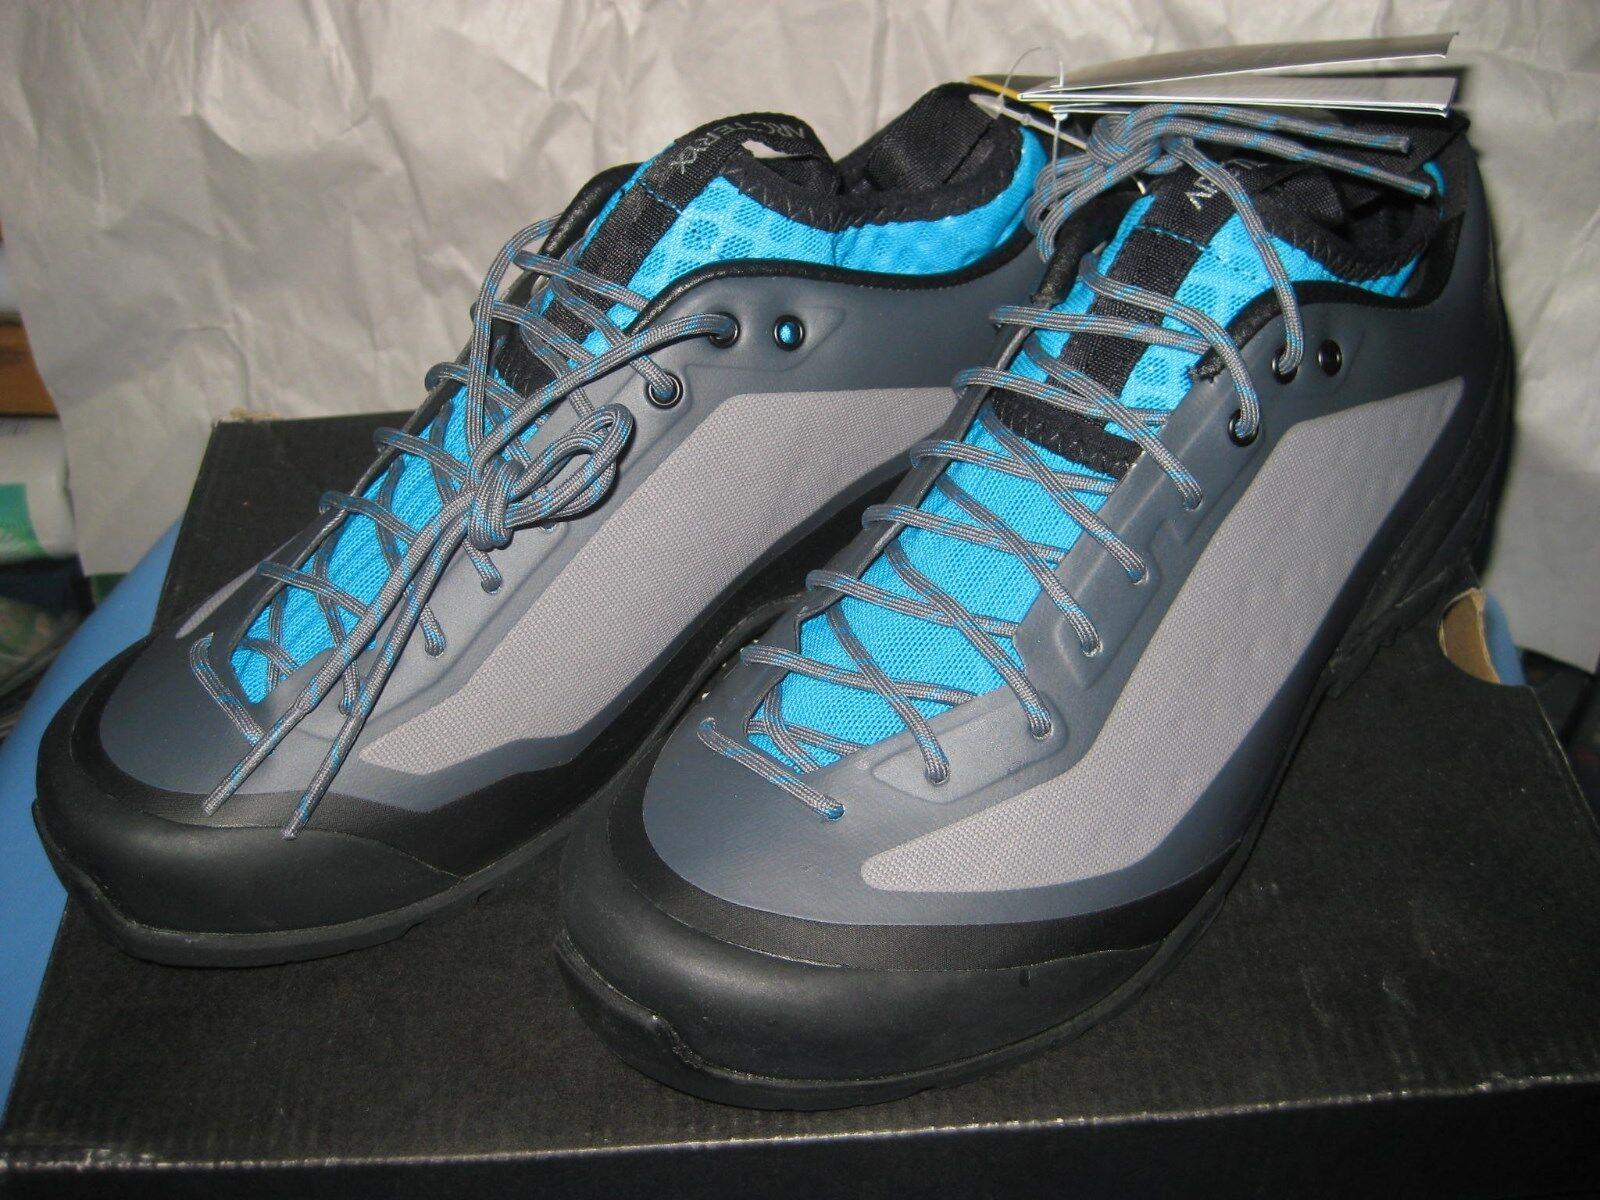 ARC'TERYX: Damen ACRUX FL OUTDOOR Schuhe (SIZE 7)